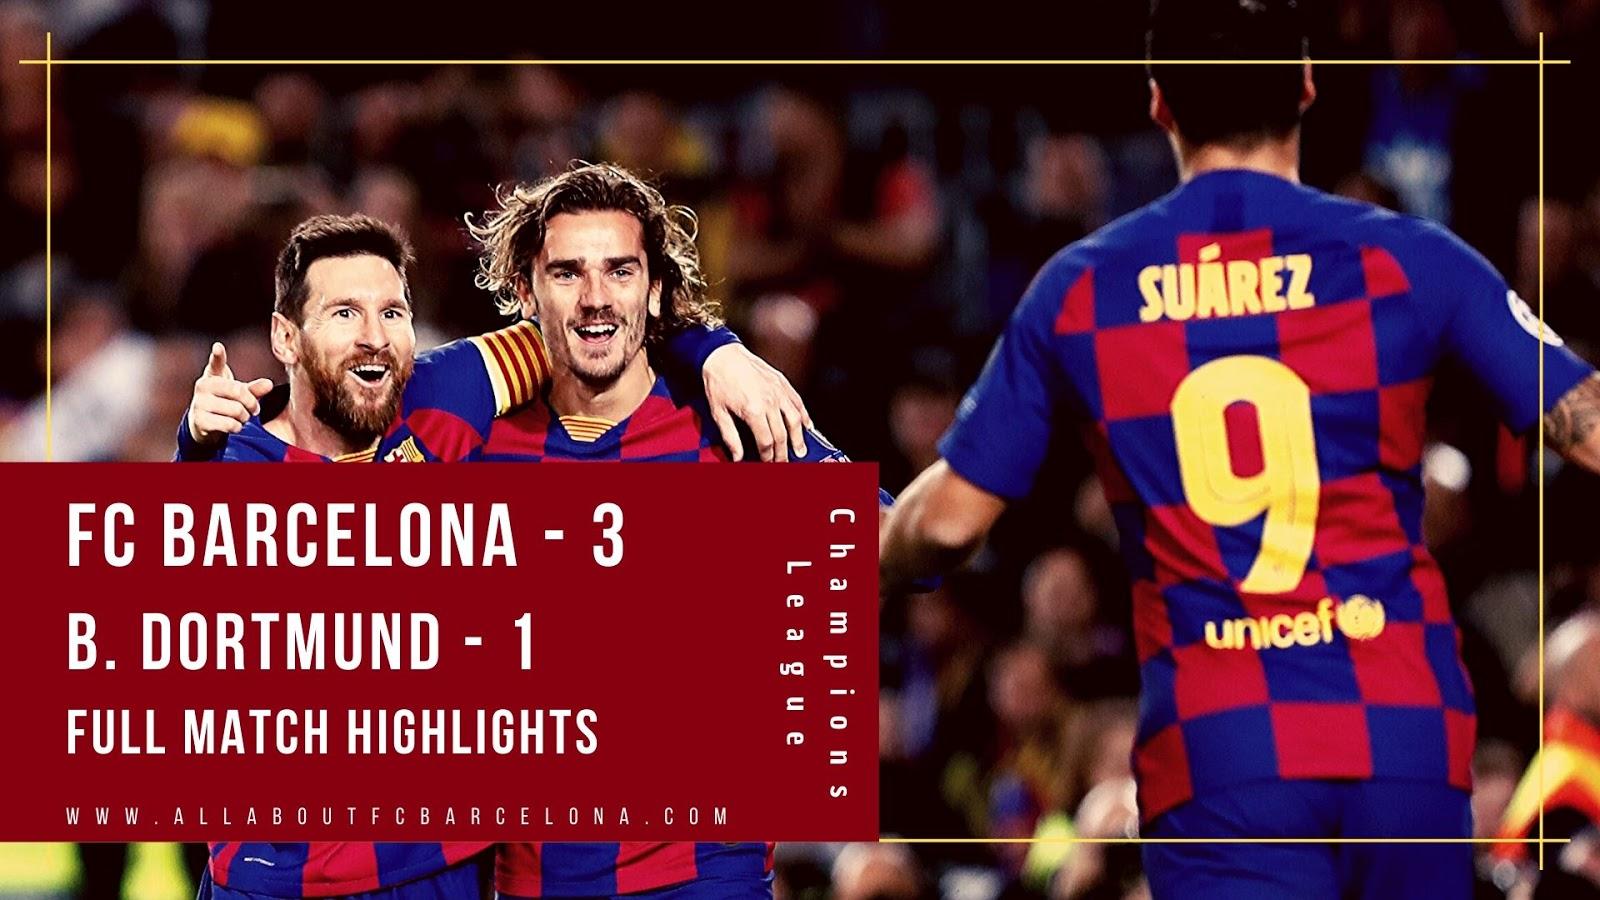 FC Barcelona vs Dortmund Video Highlights | FC Barcelona - 3, Borussia Dortmund - 1 #FCBarcelona #Barca